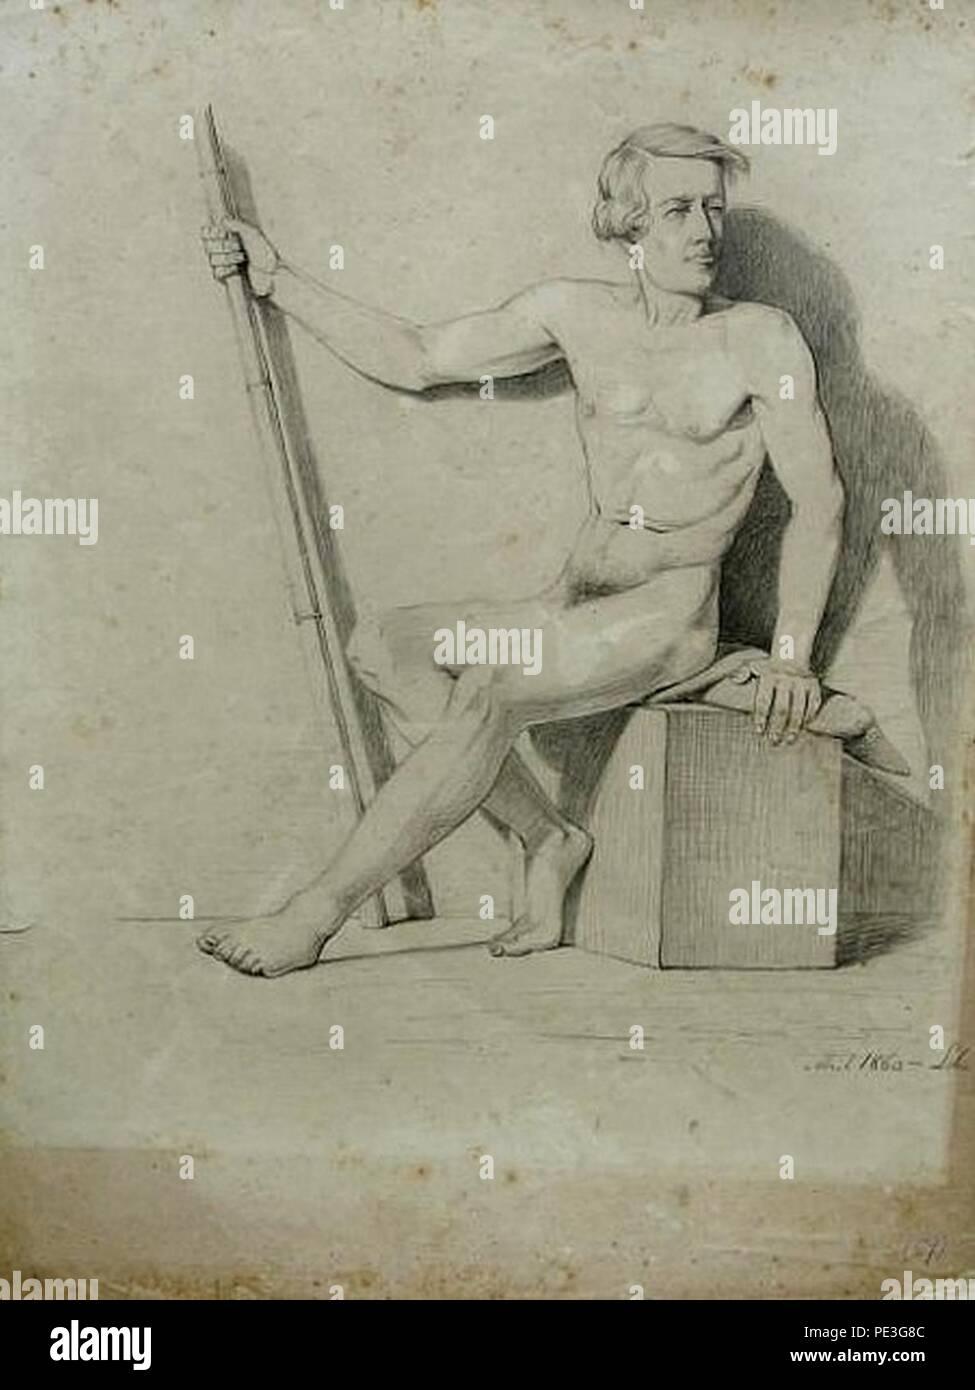 Antônio de Sousa Lobo - Nu masculino sentado. Imagen De Stock